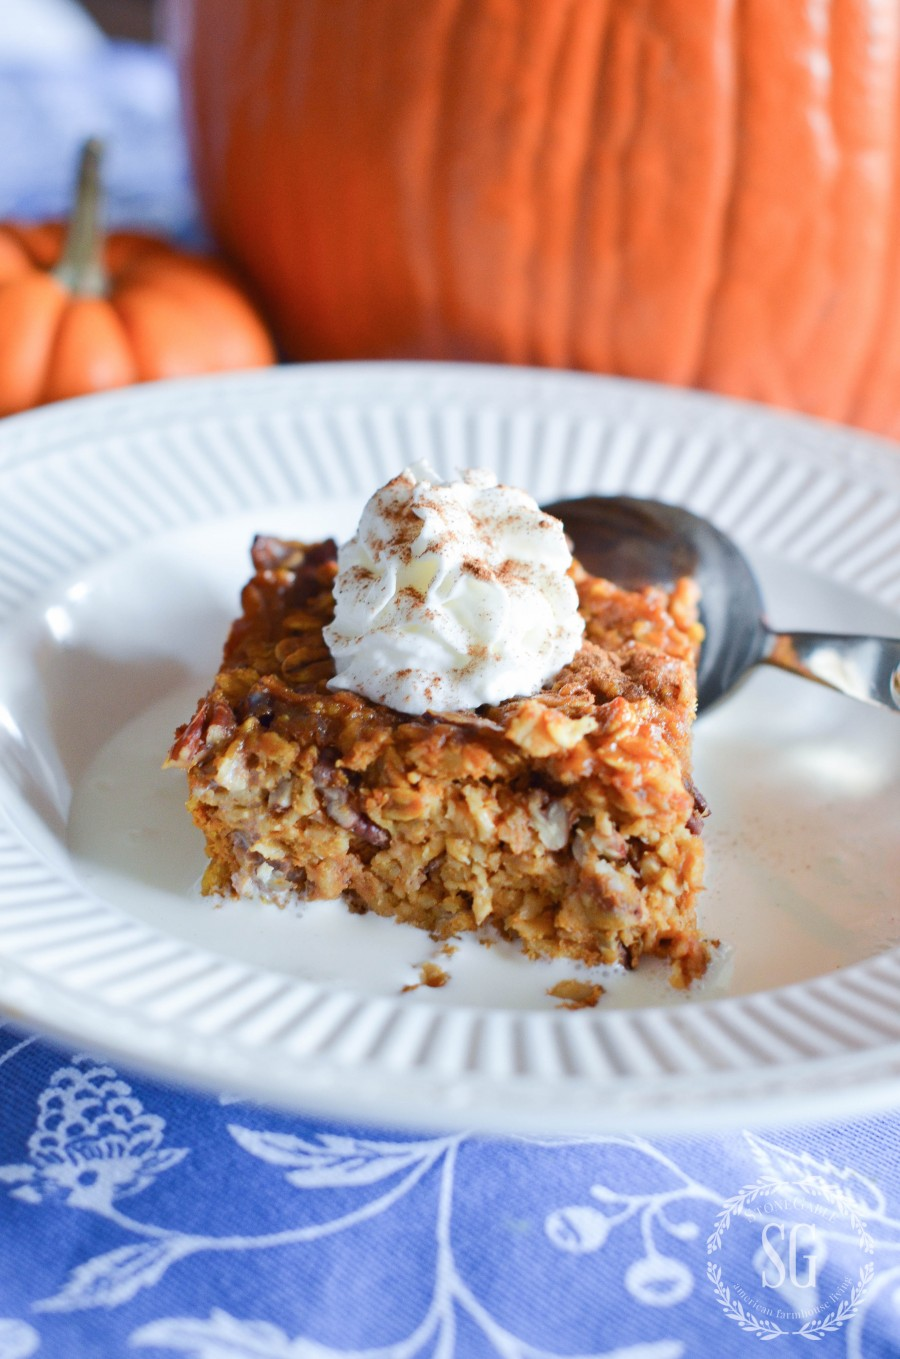 http://www.stonegableblog.com/pumpkin-spice-baked-oatmeal/